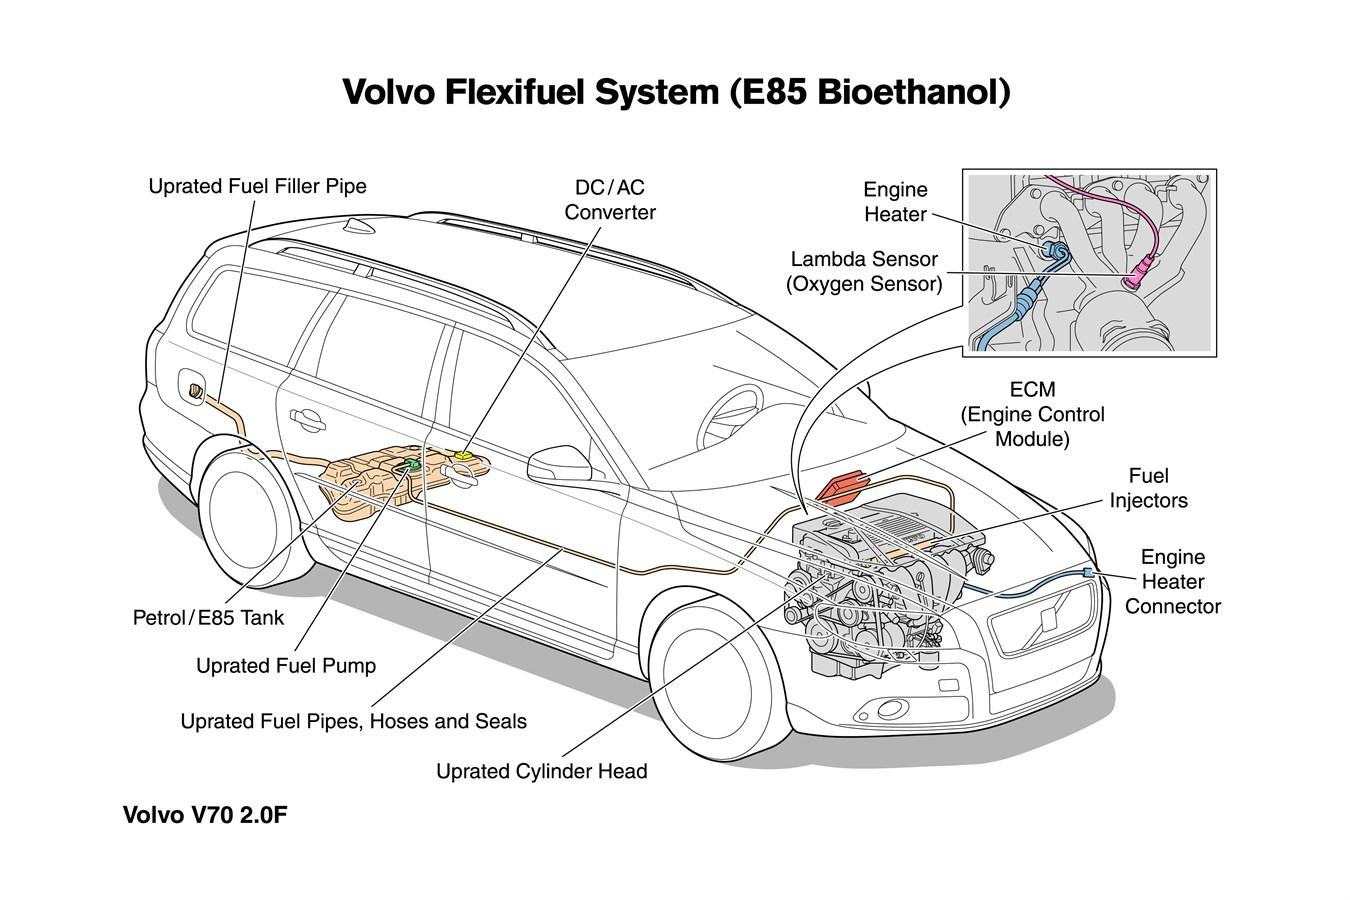 200 hp Flexifuel engine broadens the Volvo Cars bioethanol